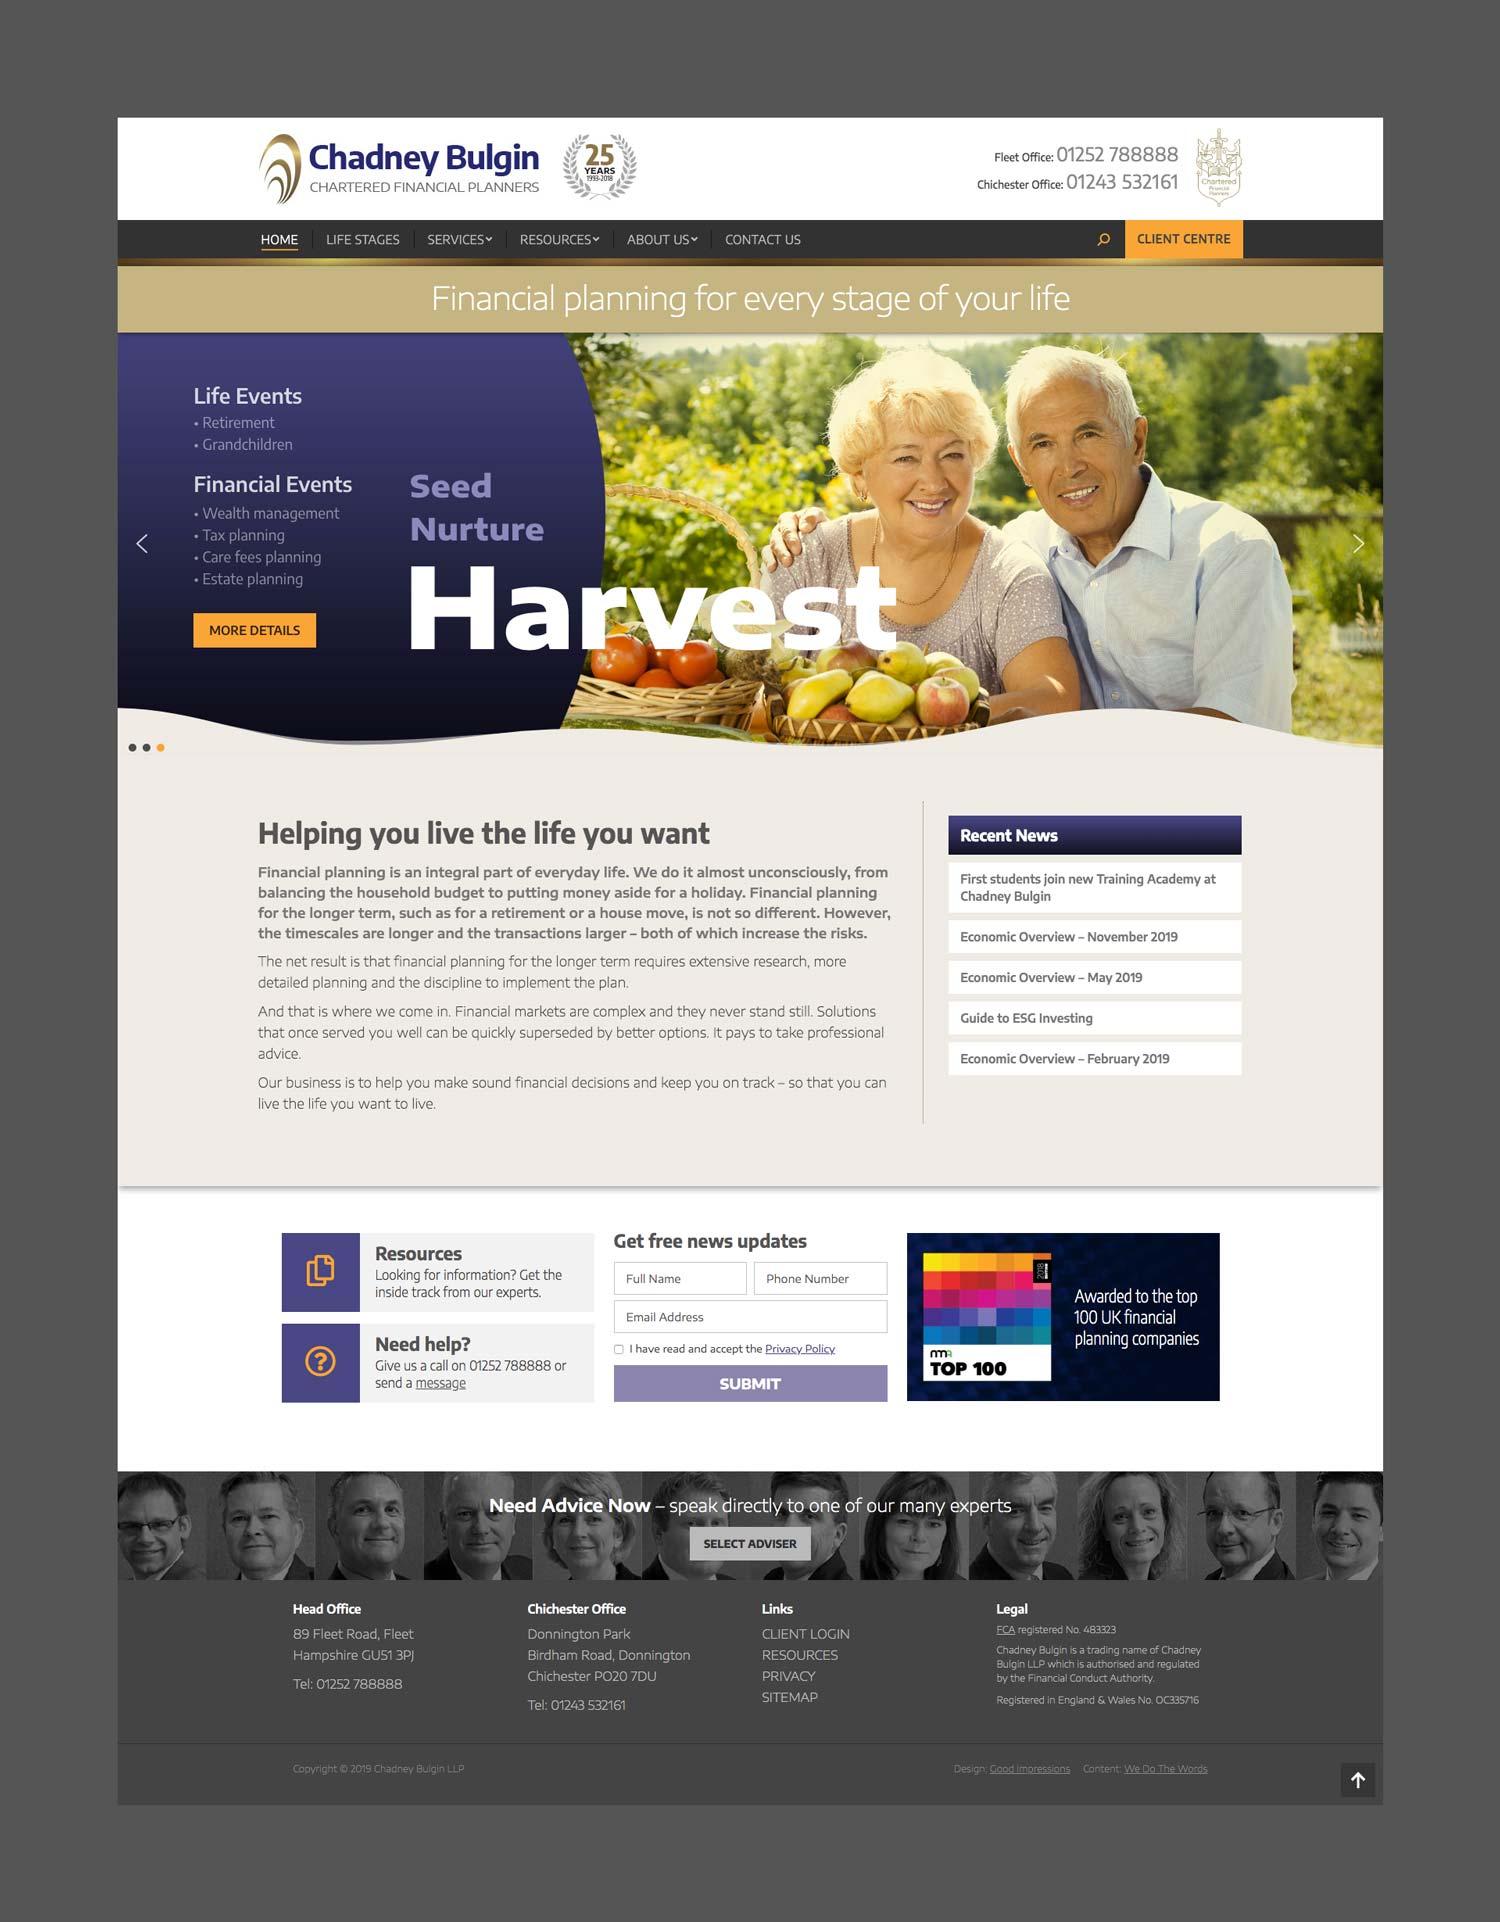 Chadney Bulgin website home page